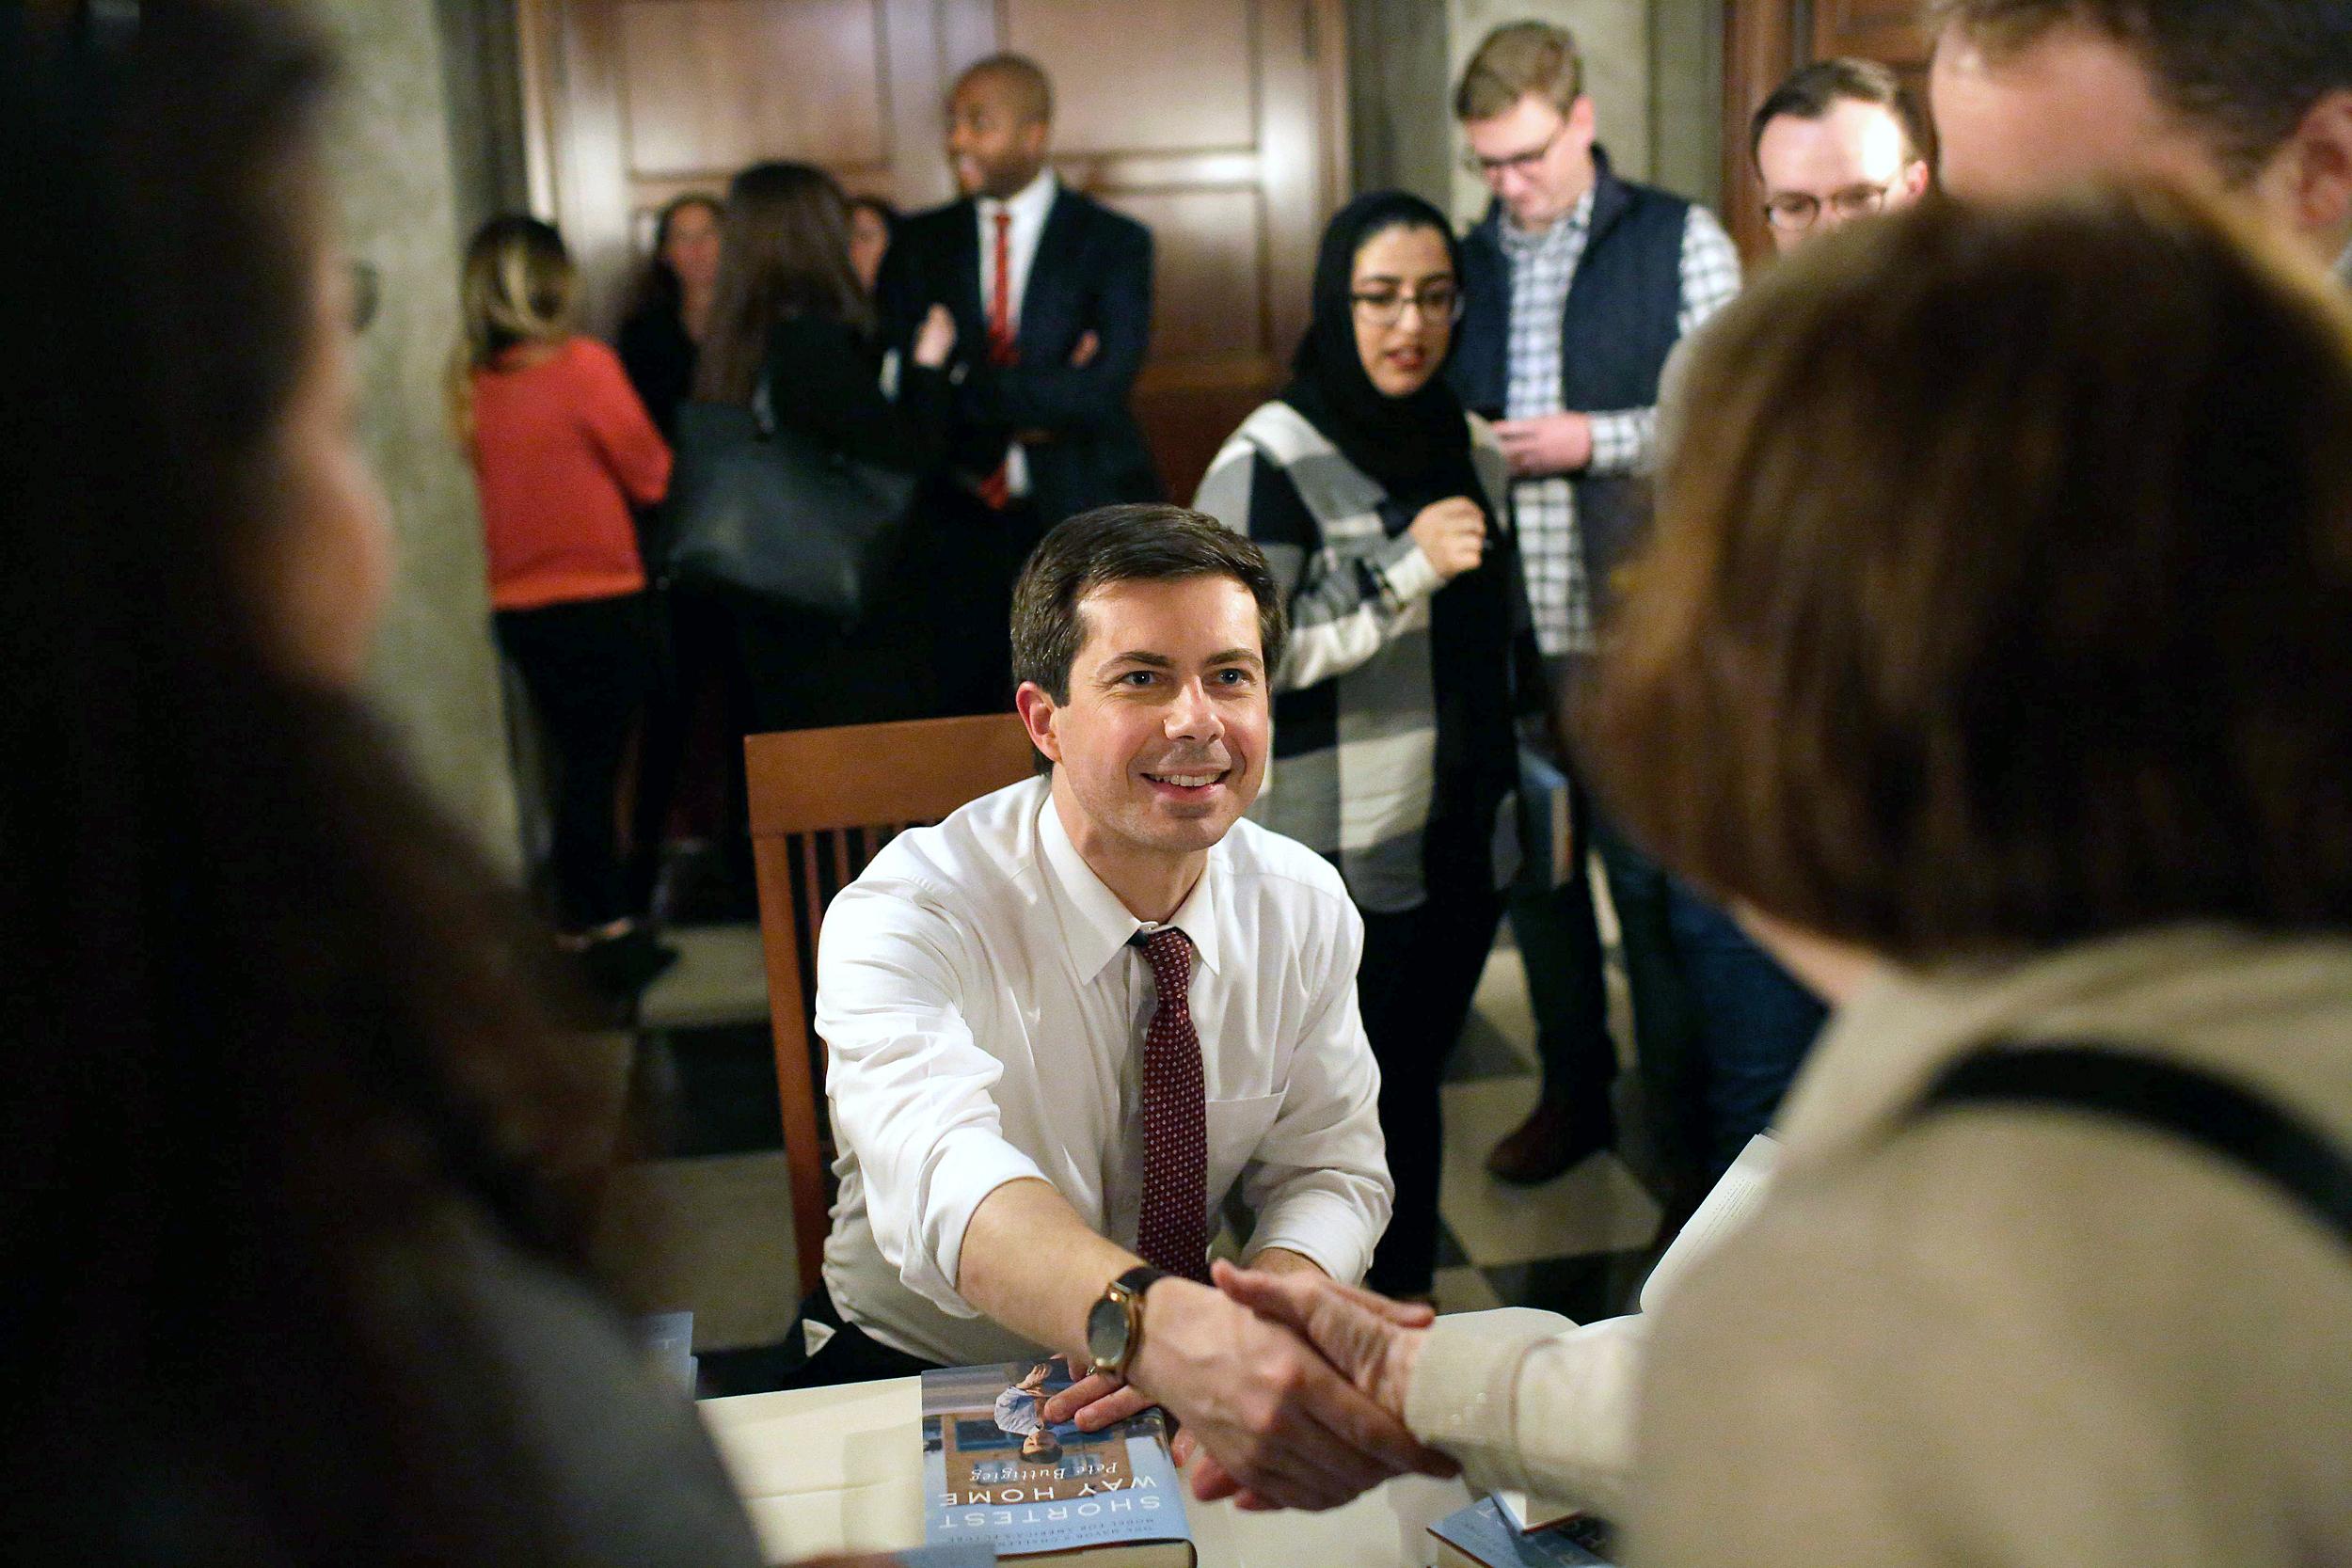 Democratic presidential hopefuls to participate in LGBTQ debate this fall